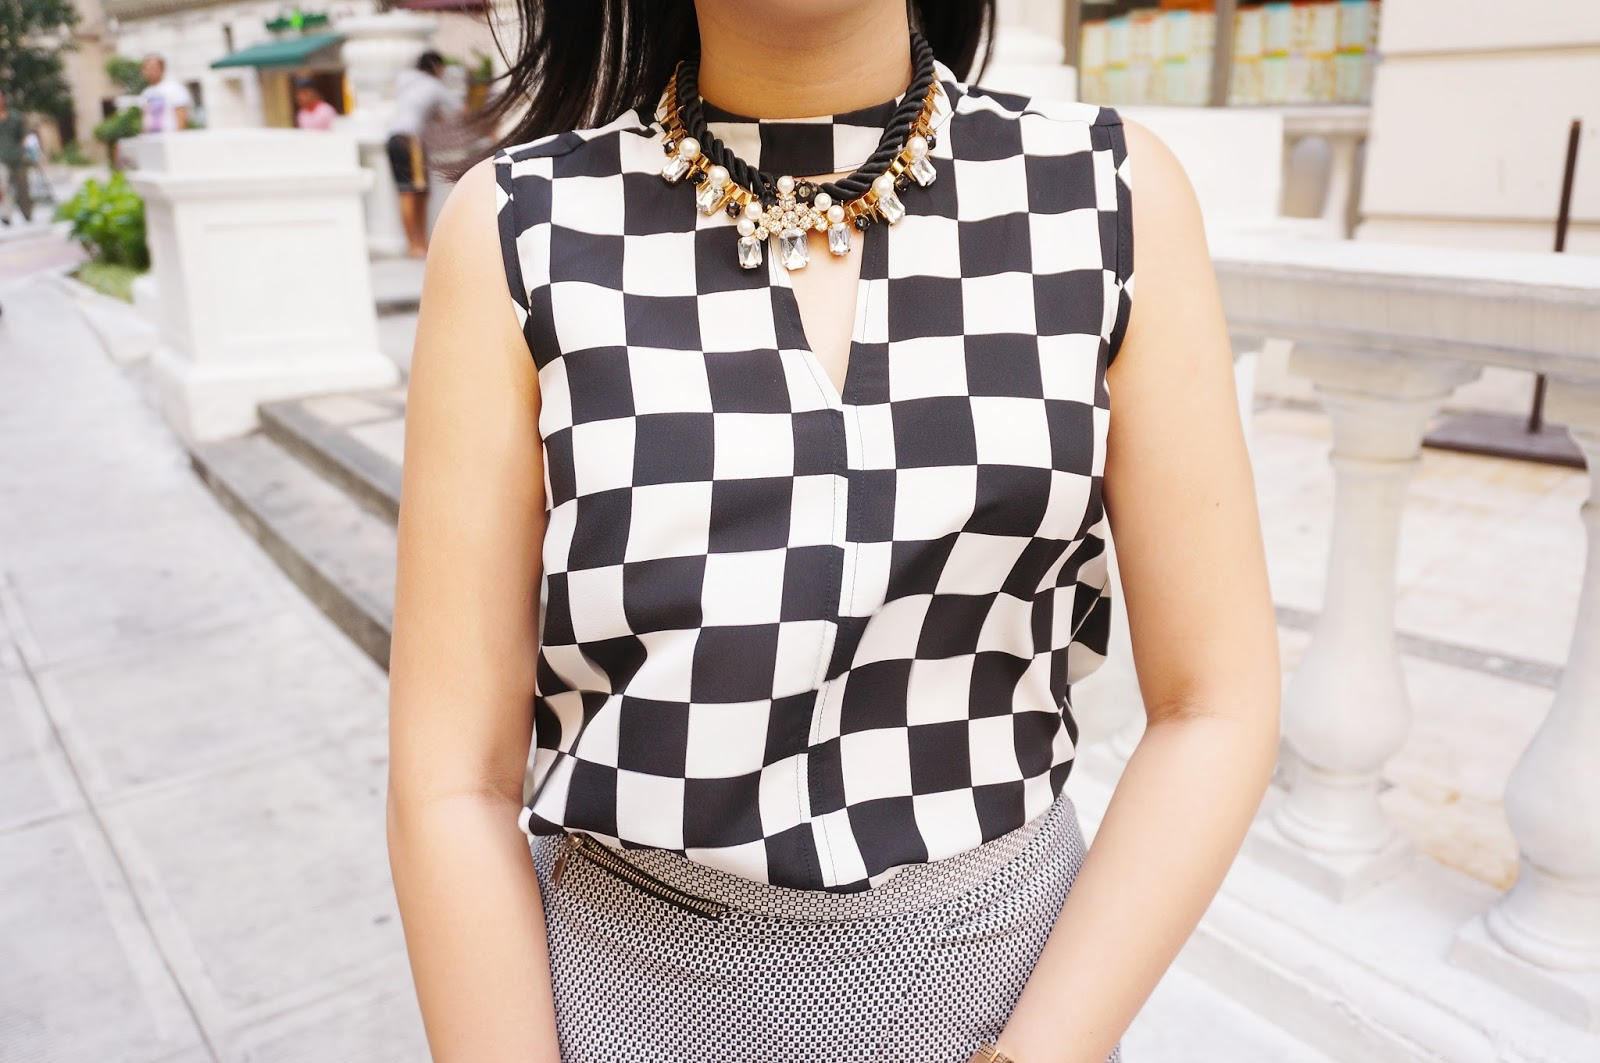 Fashion: Print Press (print on print outfits)